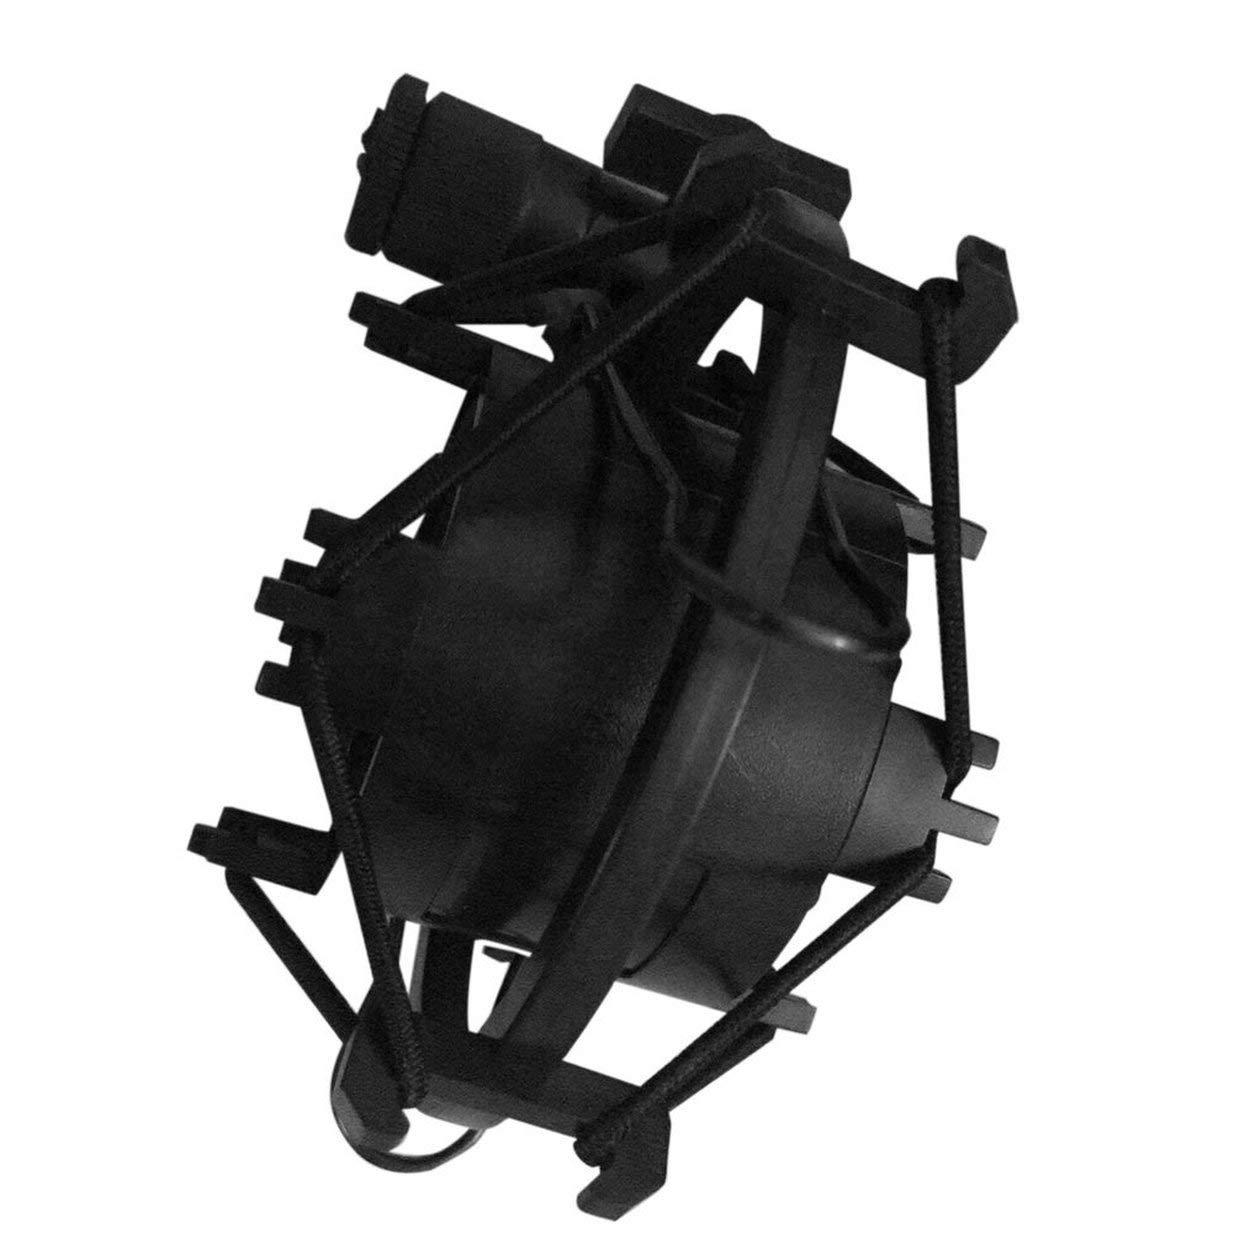 Negro Universal 3KG Bearable Load Mic Microphone Shock Mount Clip Holder Stand Radio Studio Soporte de grabaci/ón de sonido